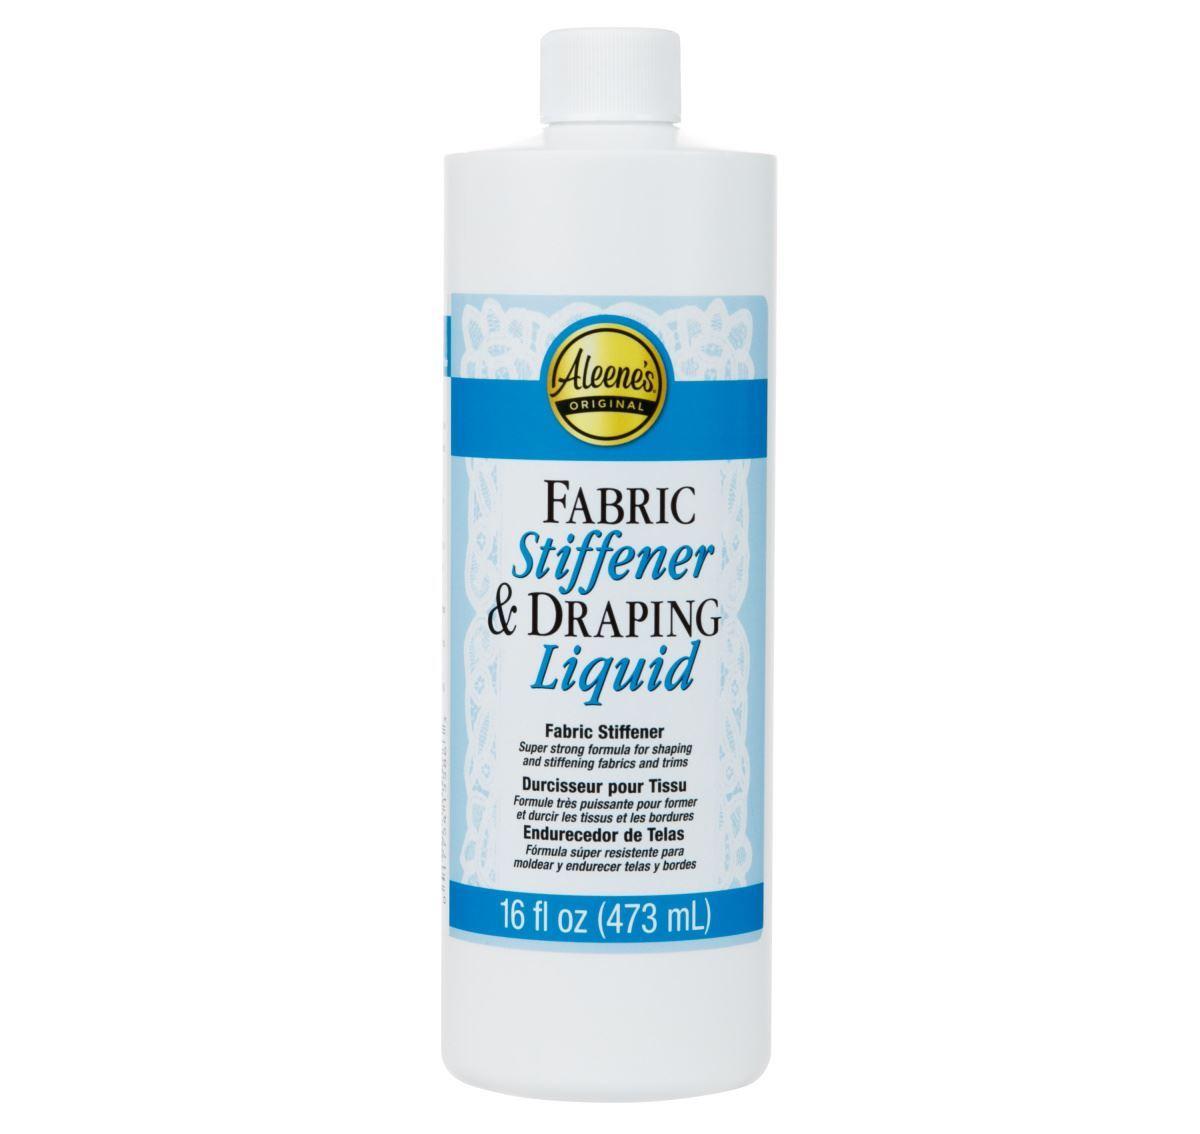 Aleene's ® Fabric Stiffener & Draping Liquid